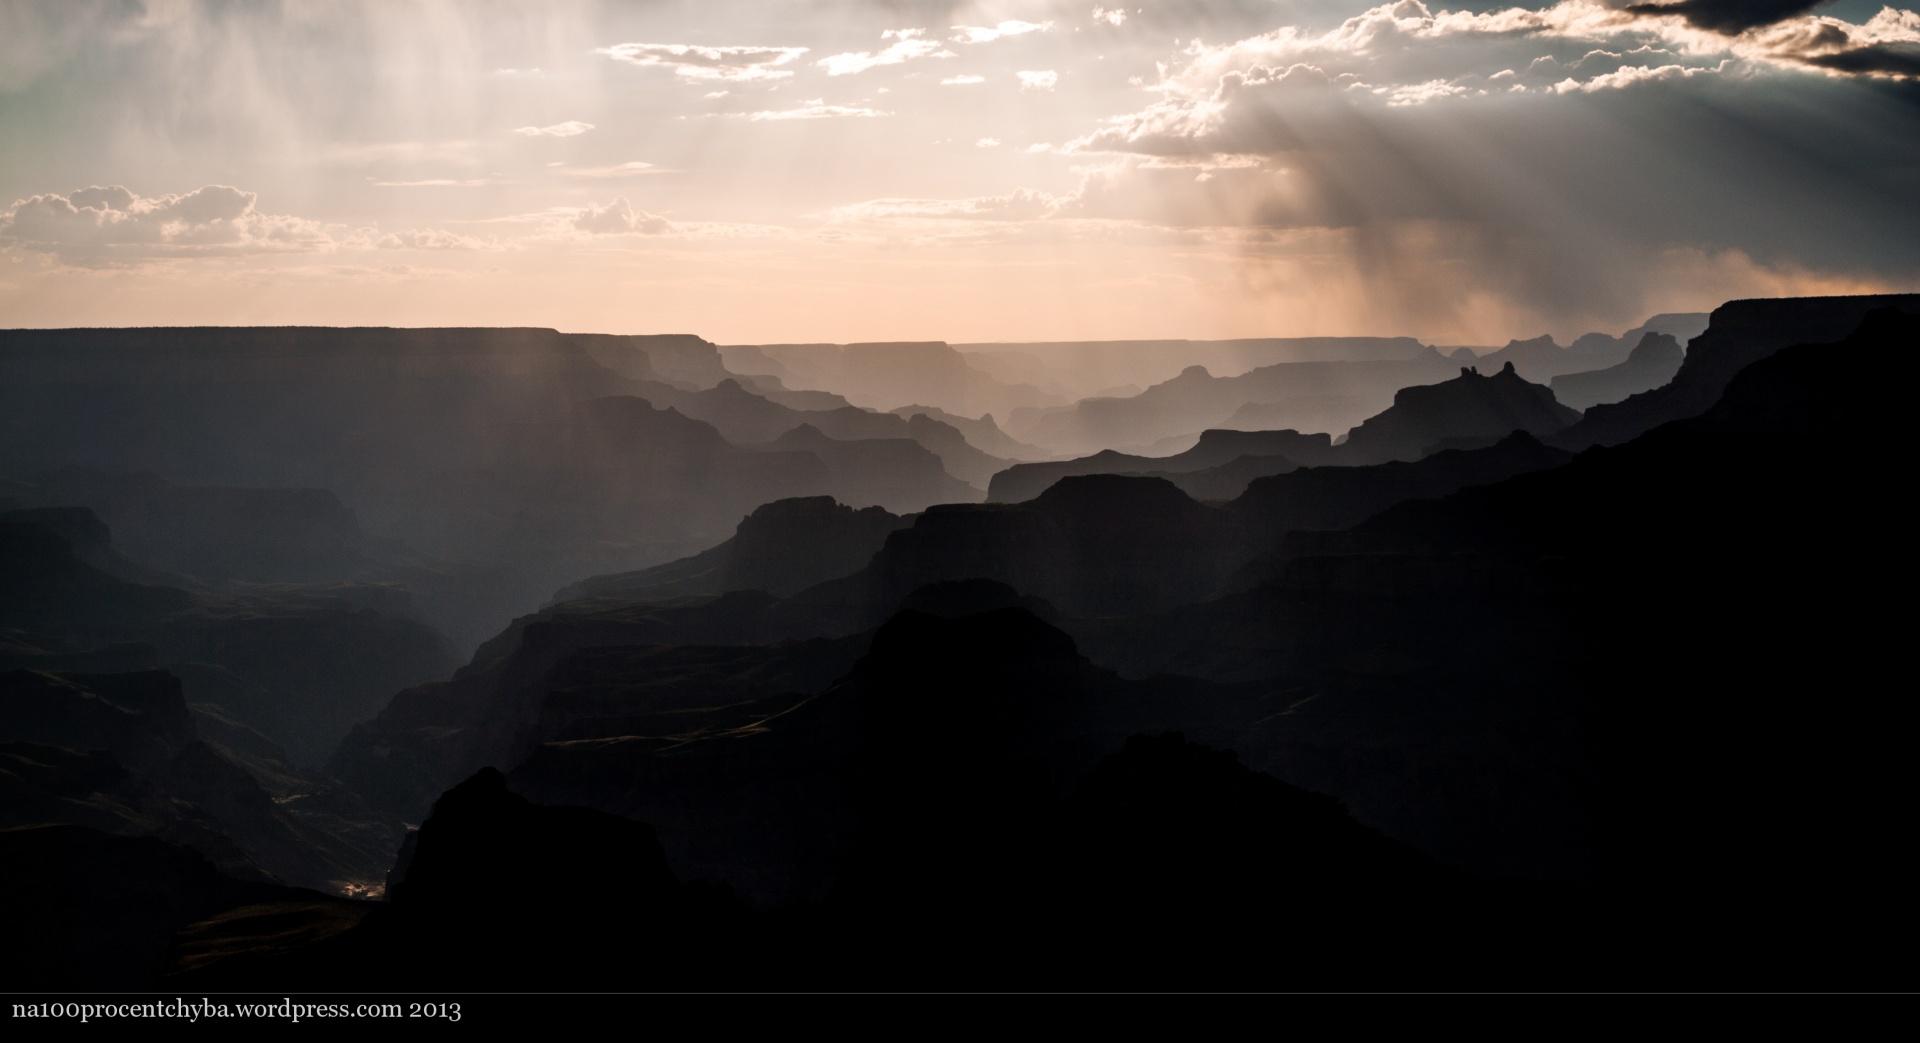 hillsides and shadows / stoki i cienie